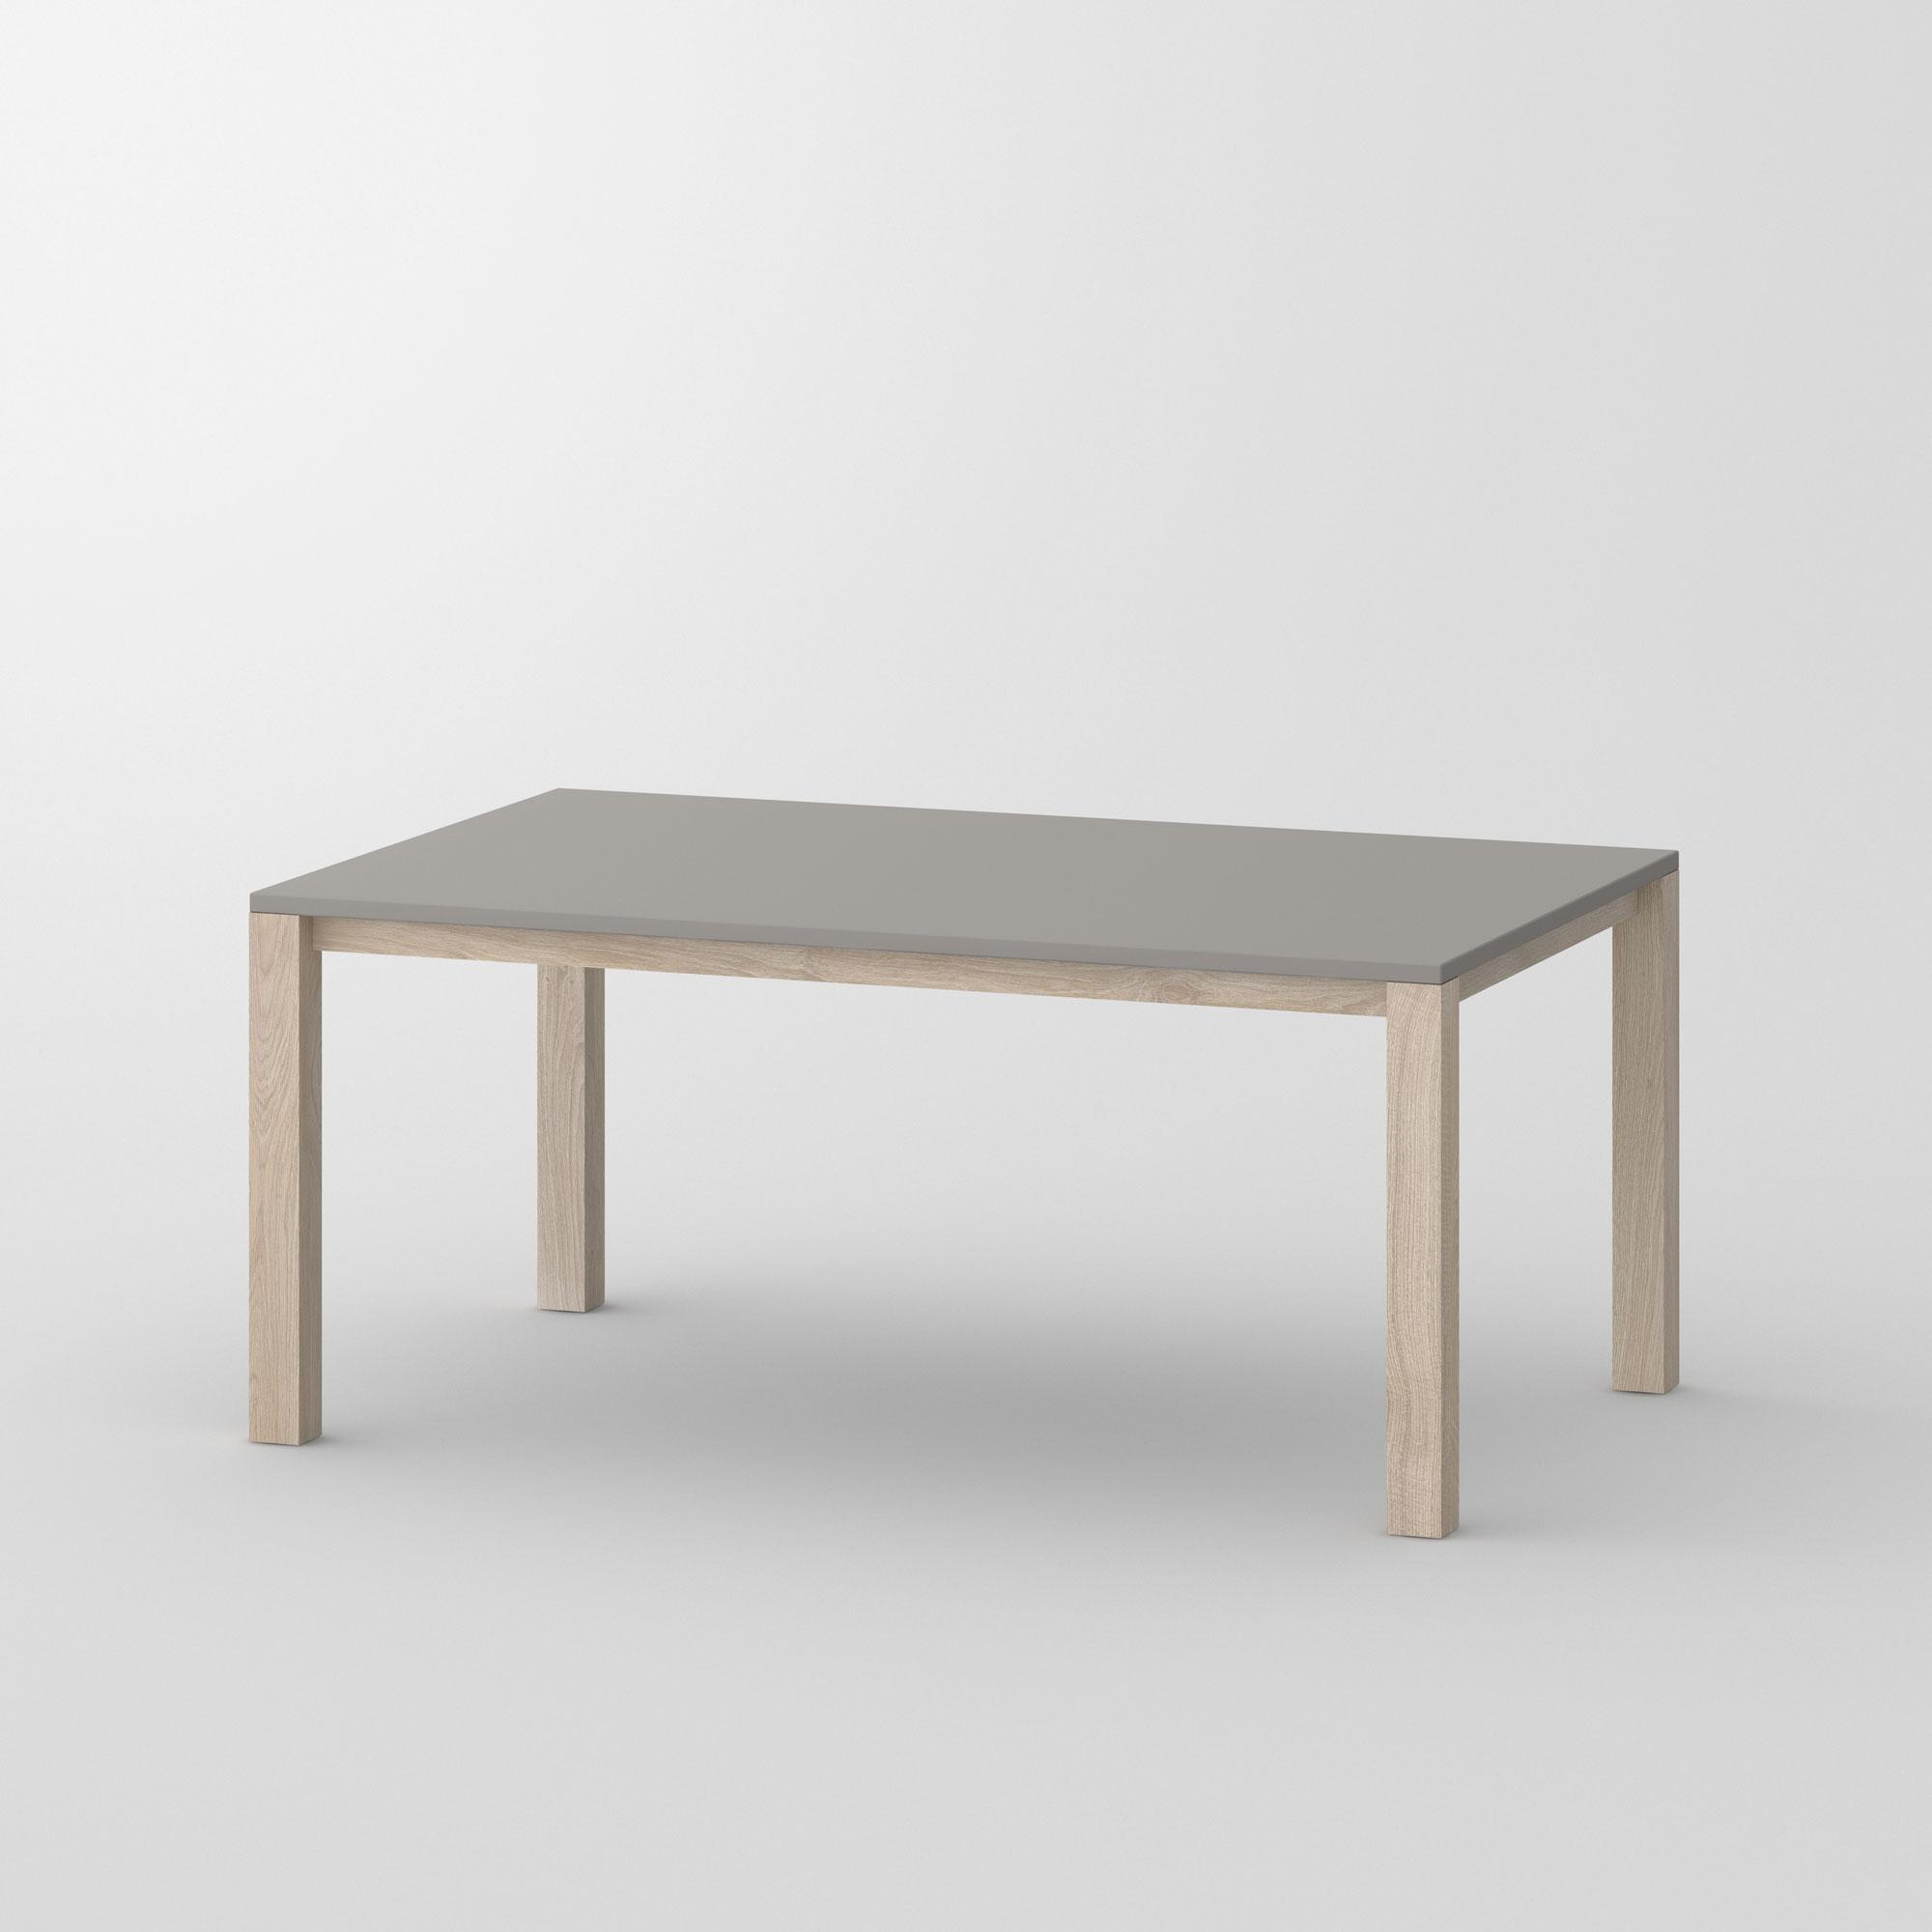 Linoleum Platten Basic Linoleum Table Top Tabletops Lino: Variable Linoleum Table VARIUS BASIC LINO